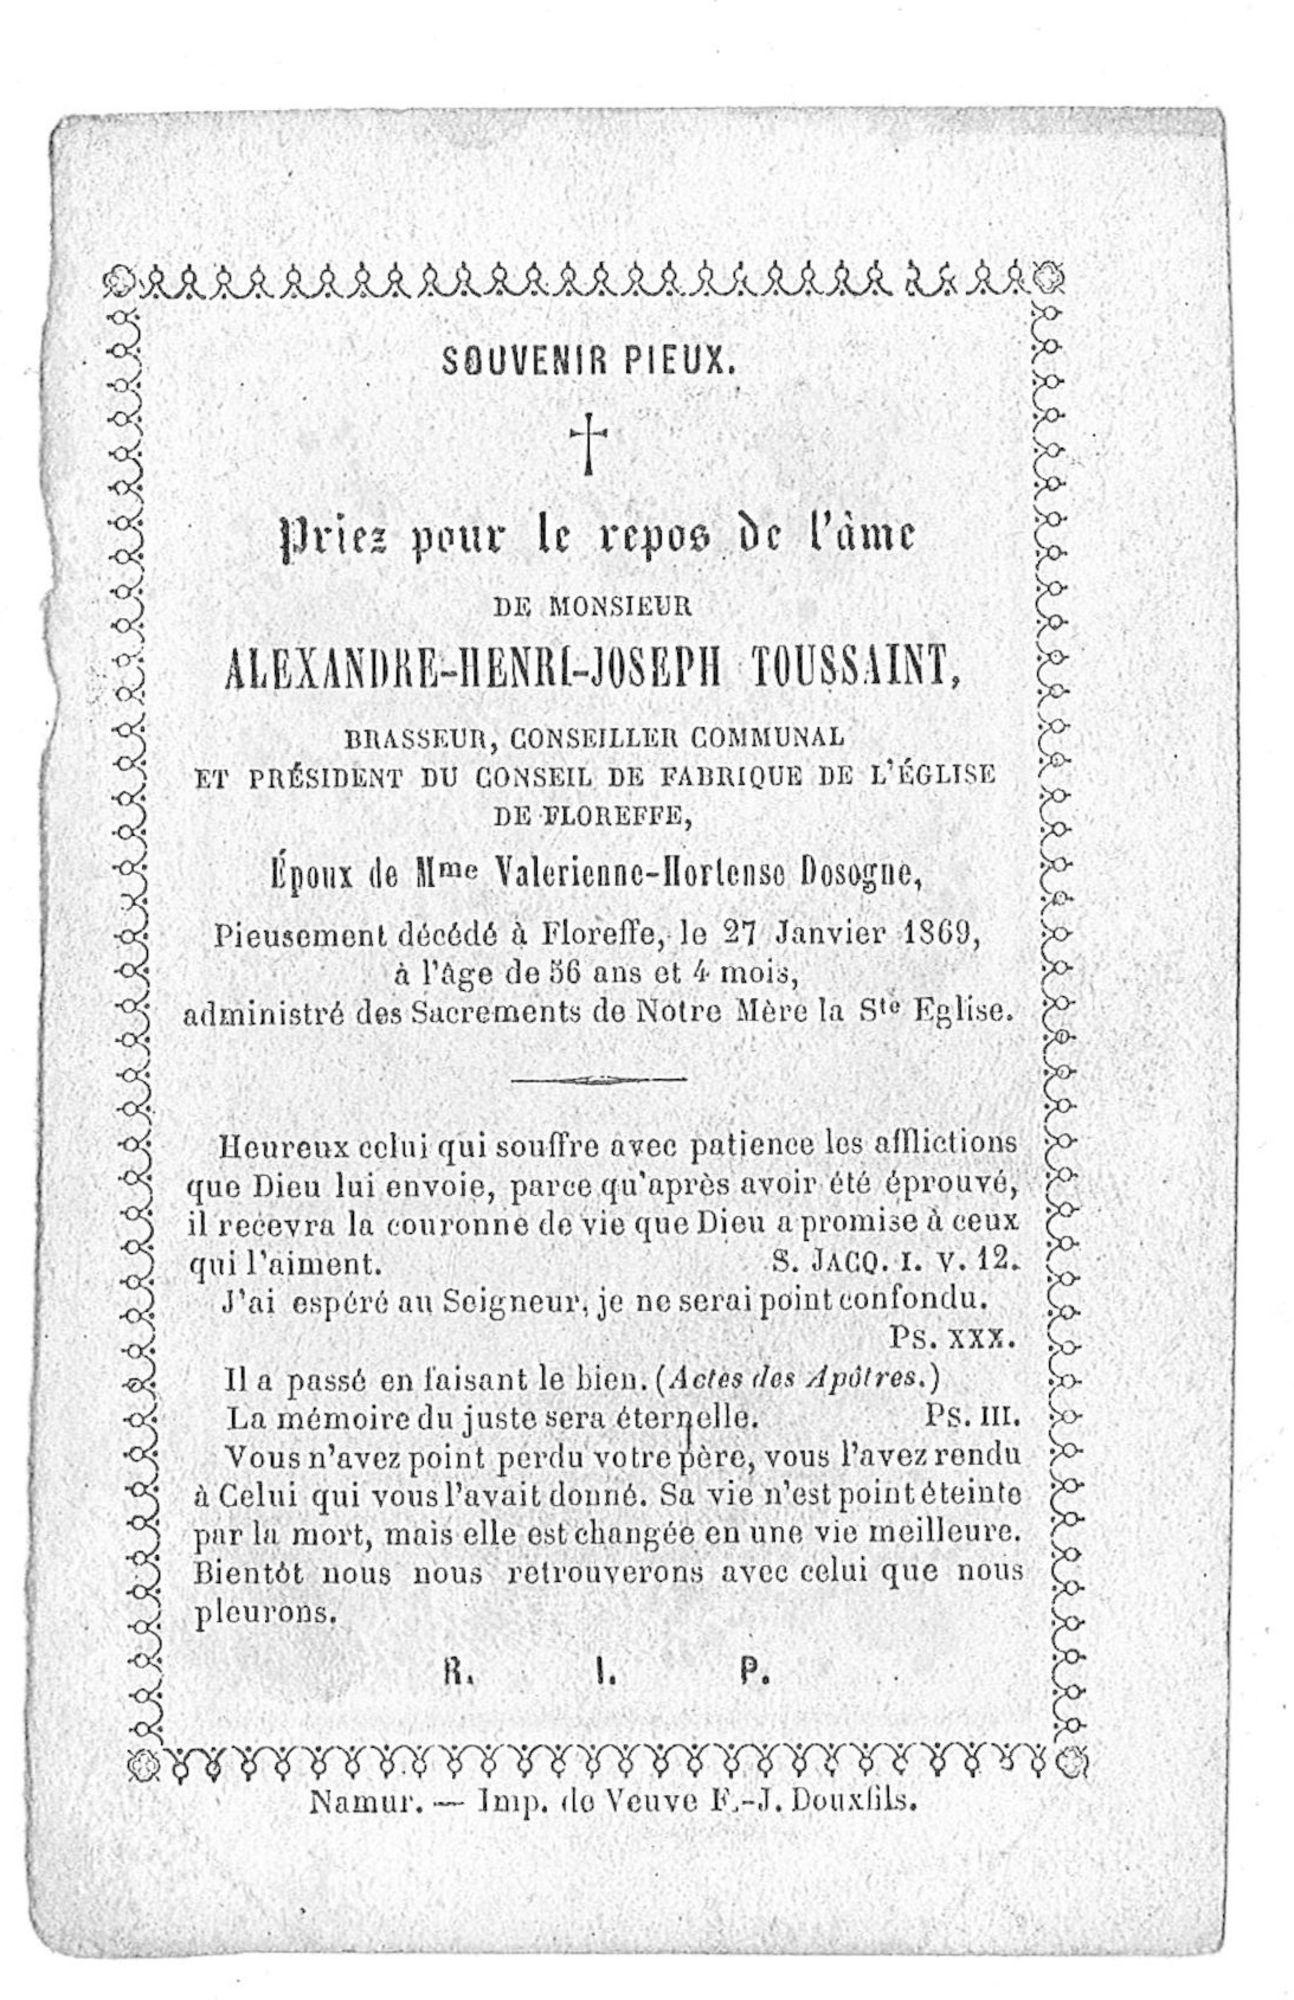 Alexandre-Henri-Joseph Toussaint